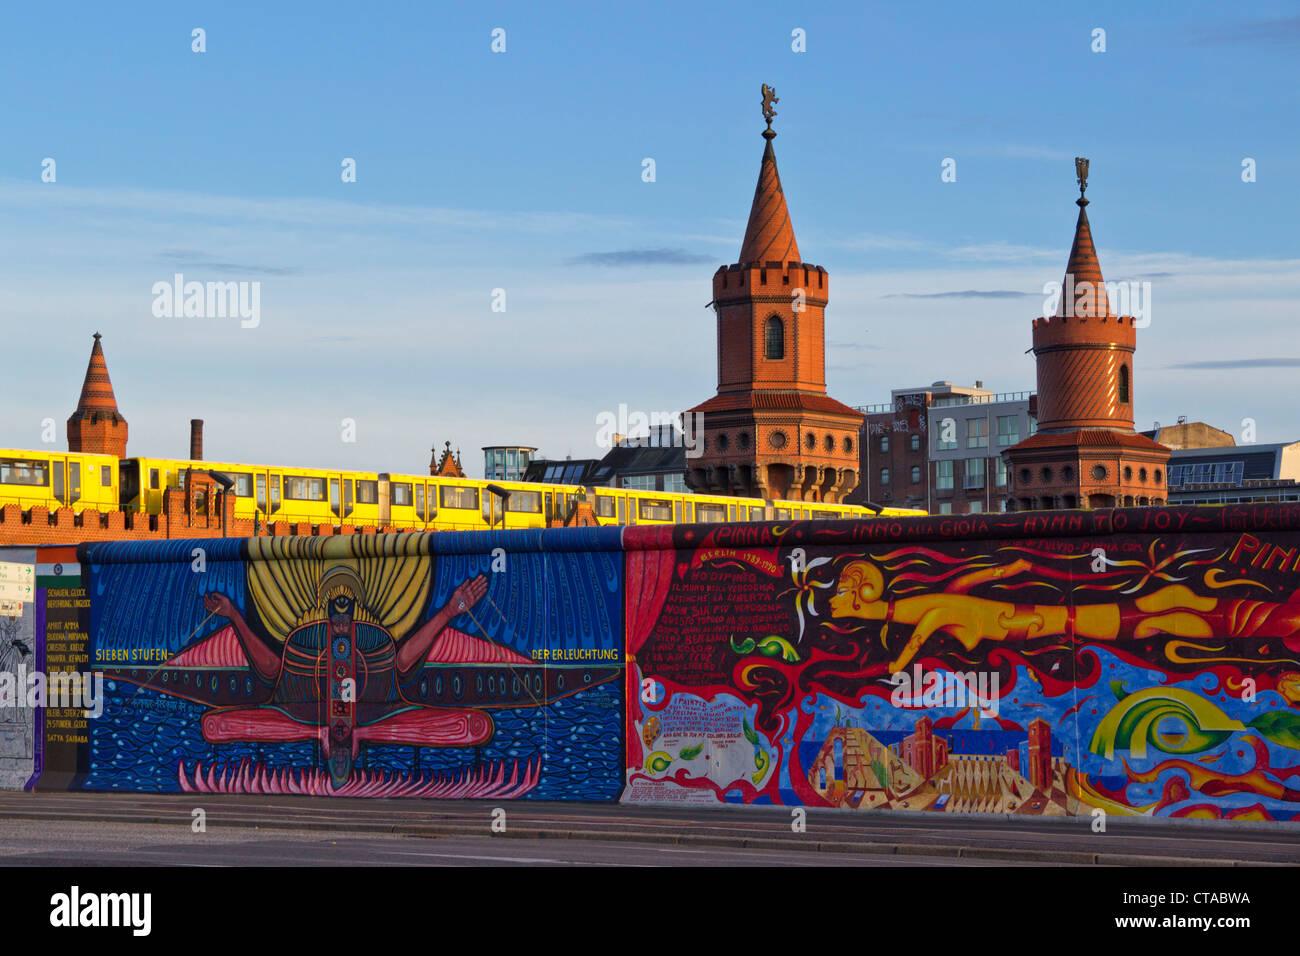 Photo murale Berlin, East Side Gallery, Berlin, Germany, Europe Photo Stock